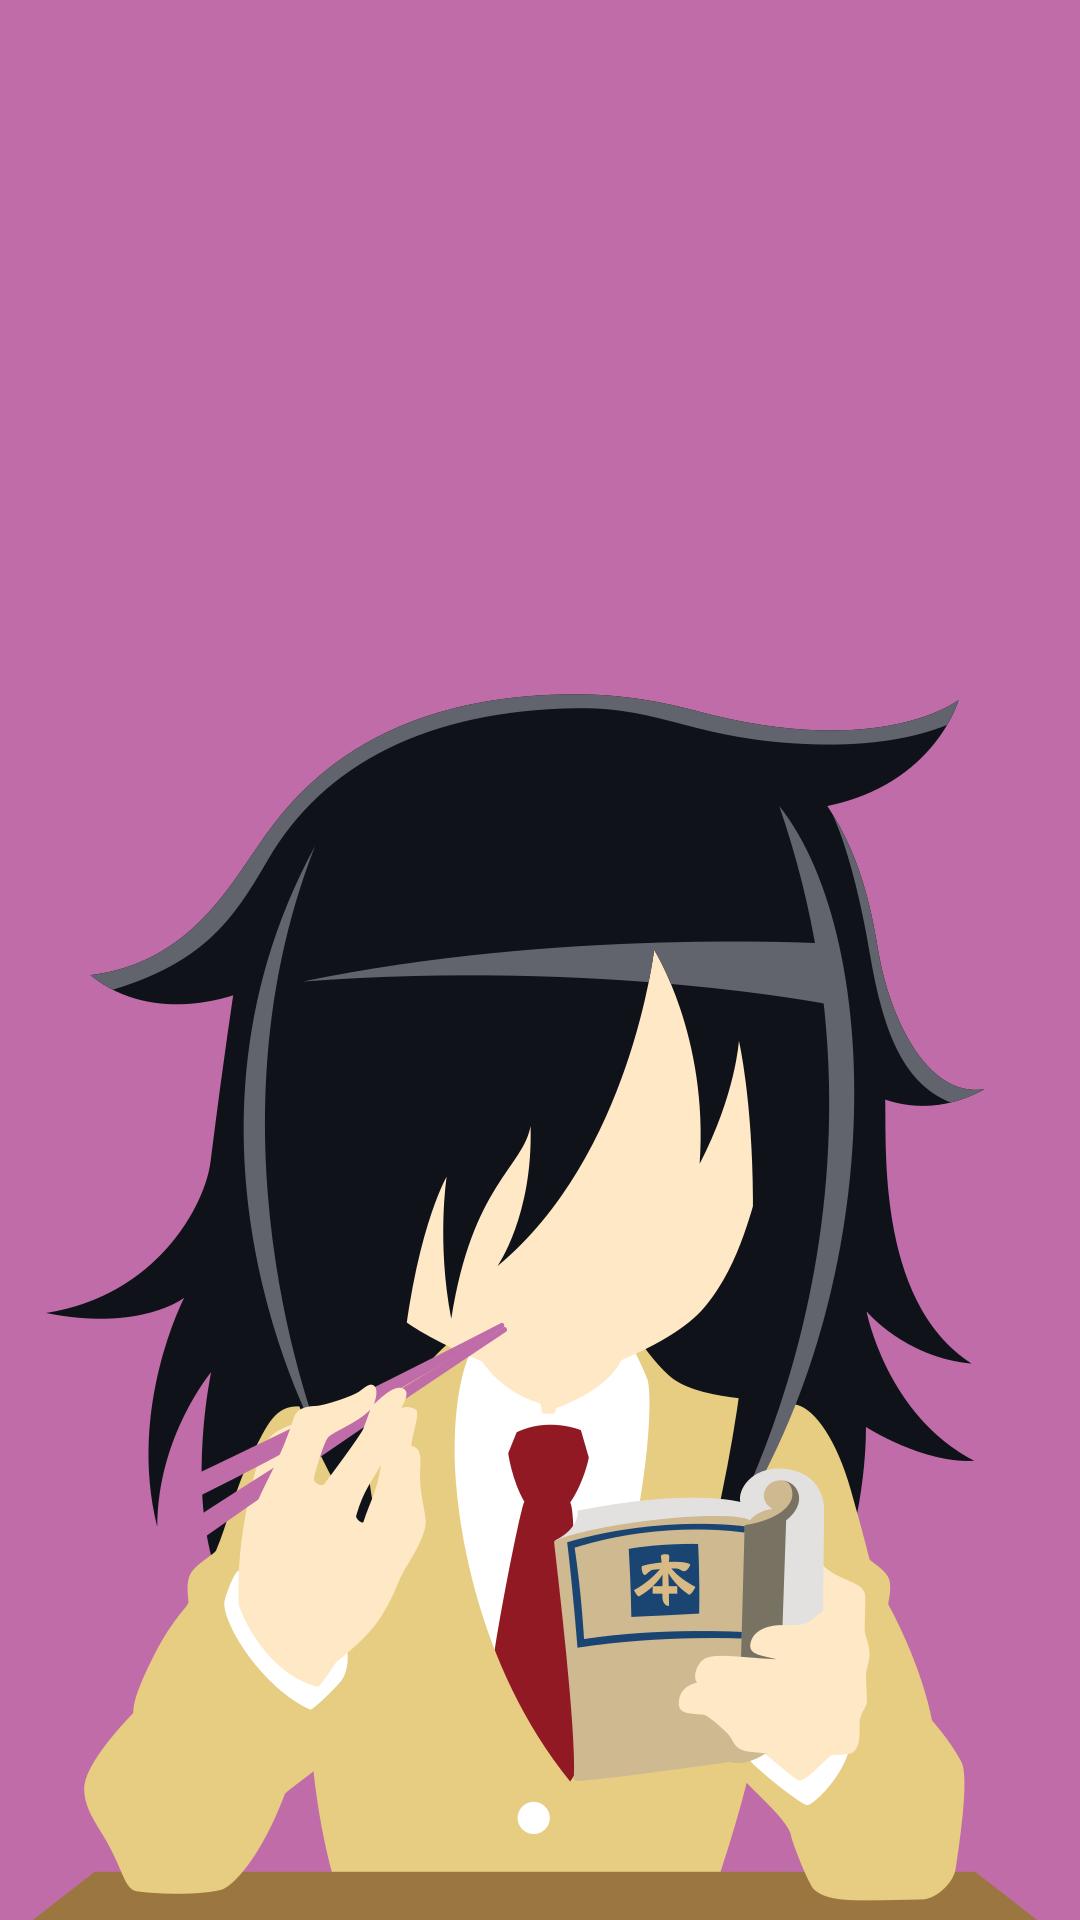 Minimalist Tomoko Kuroki Mobile Wallpaper (1080x1920